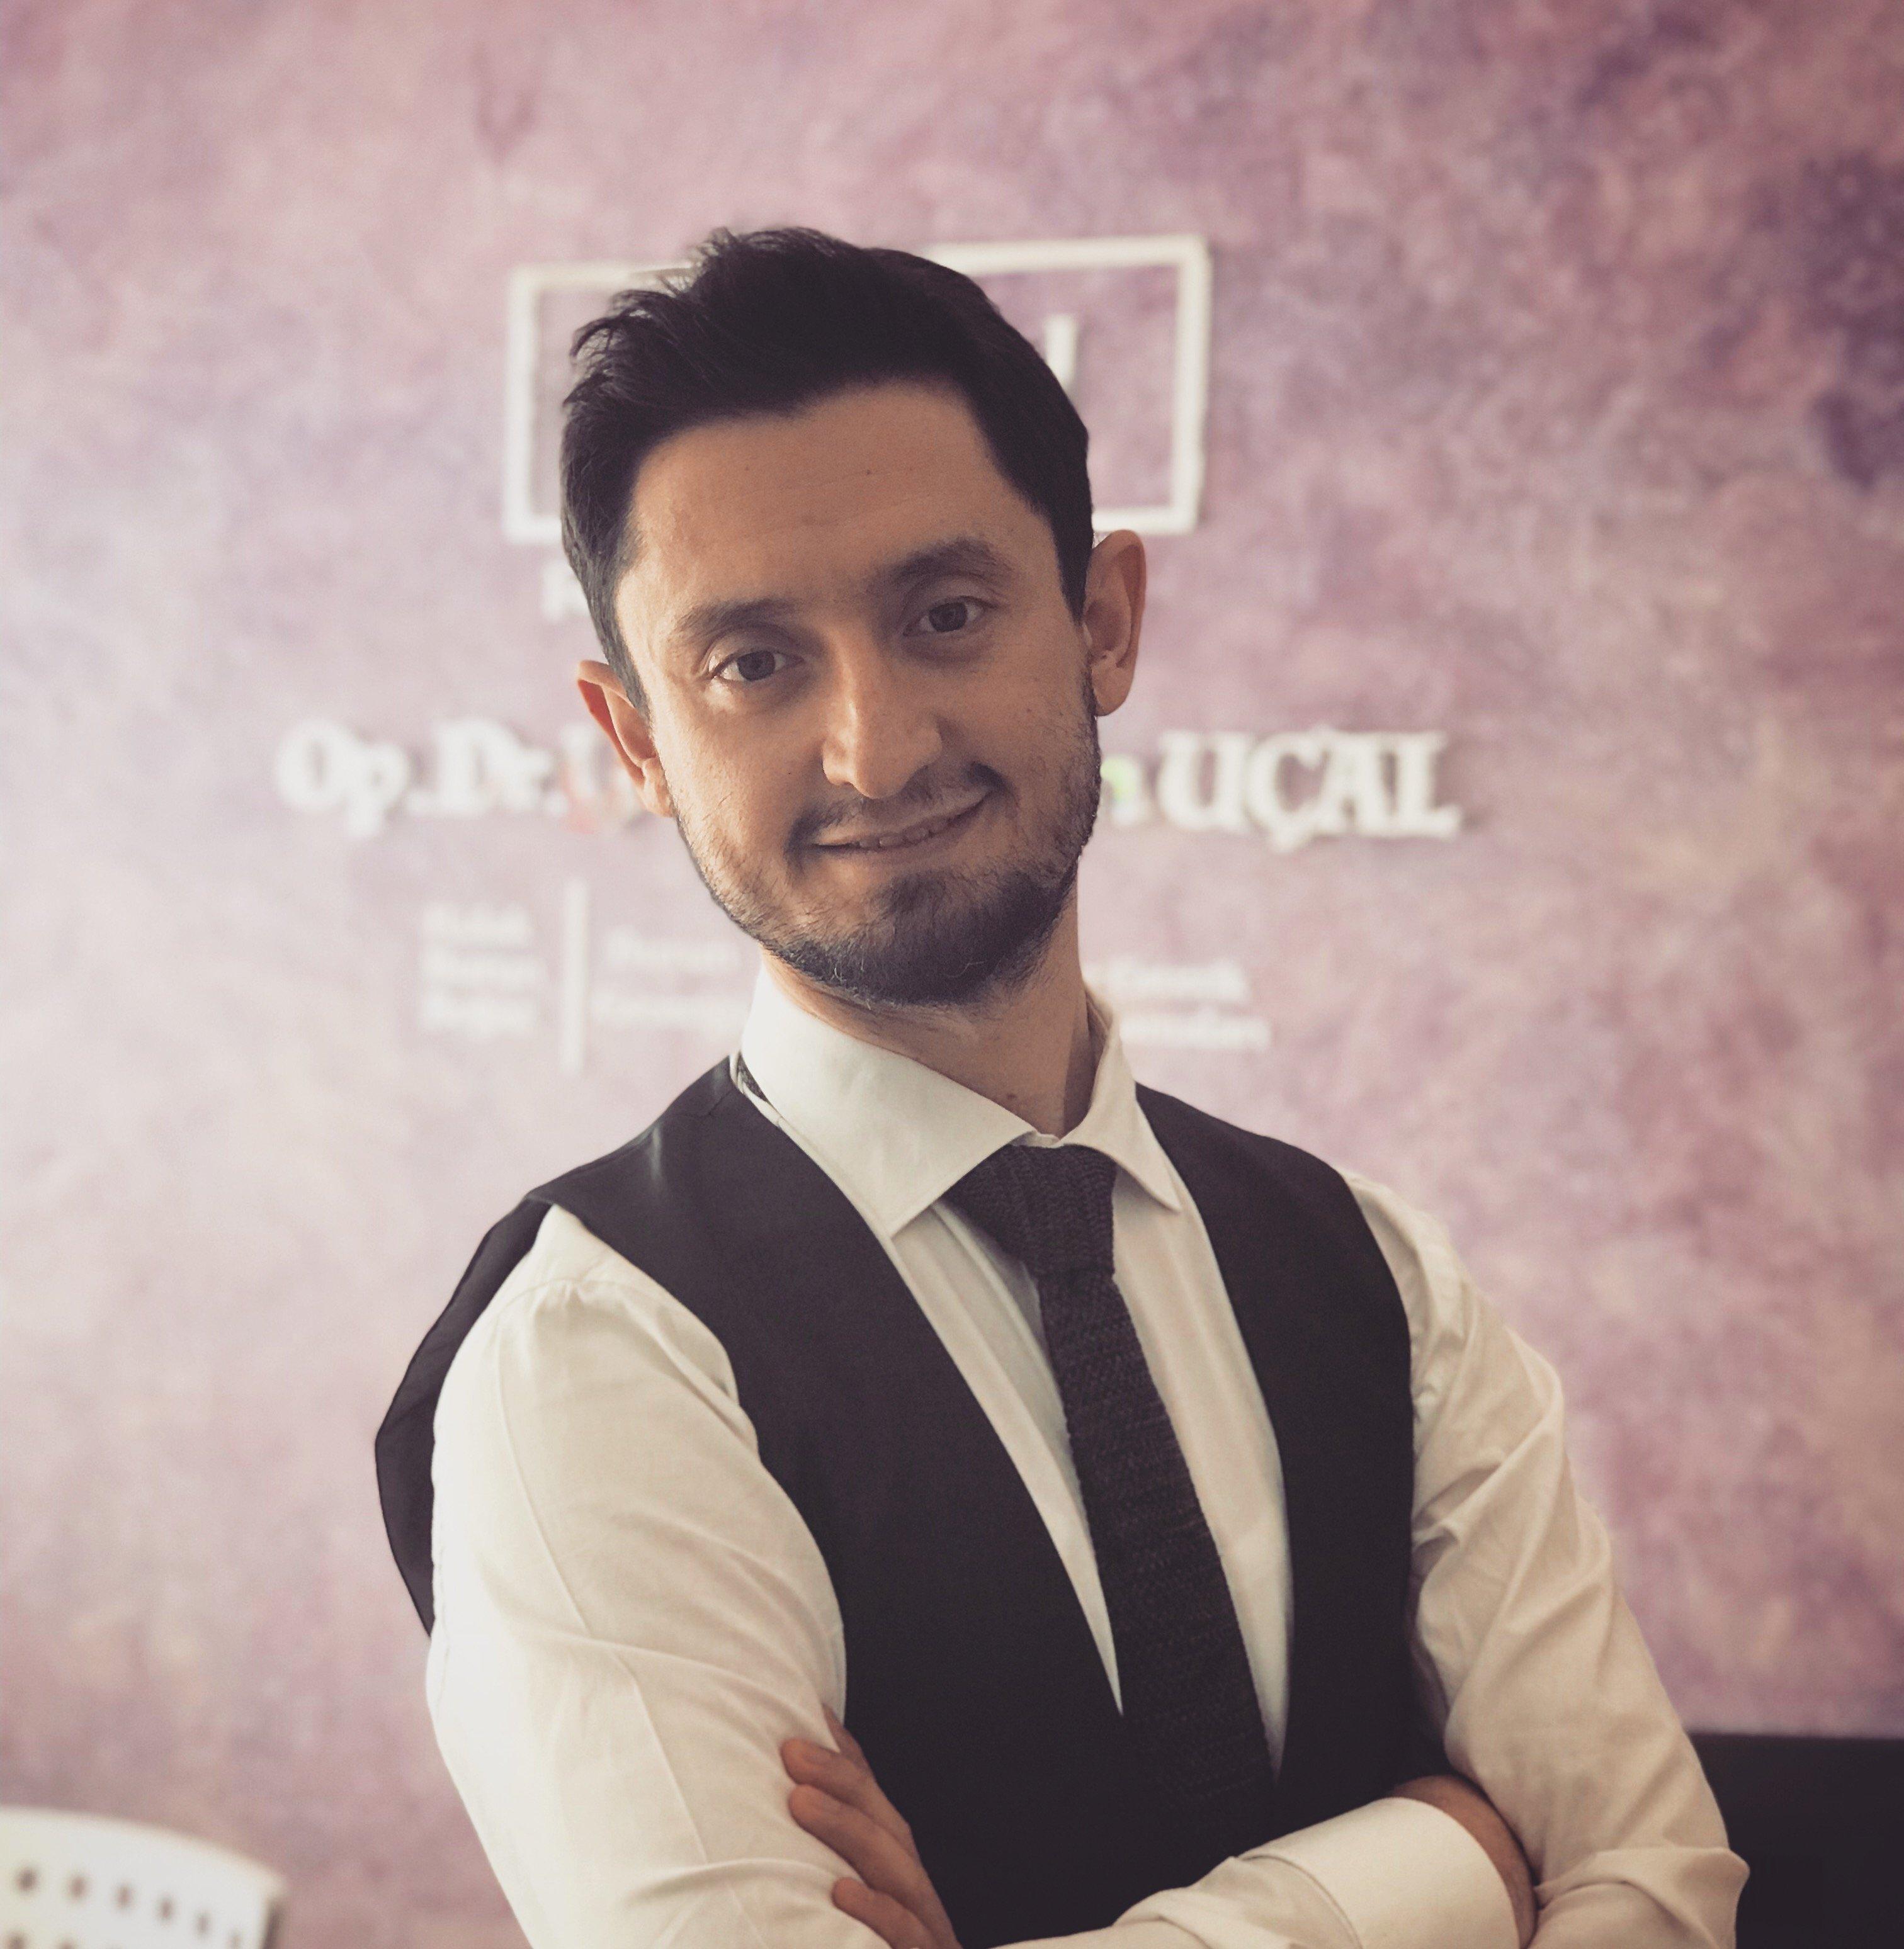 Op. Dr. Yusuf Orhan Uçal